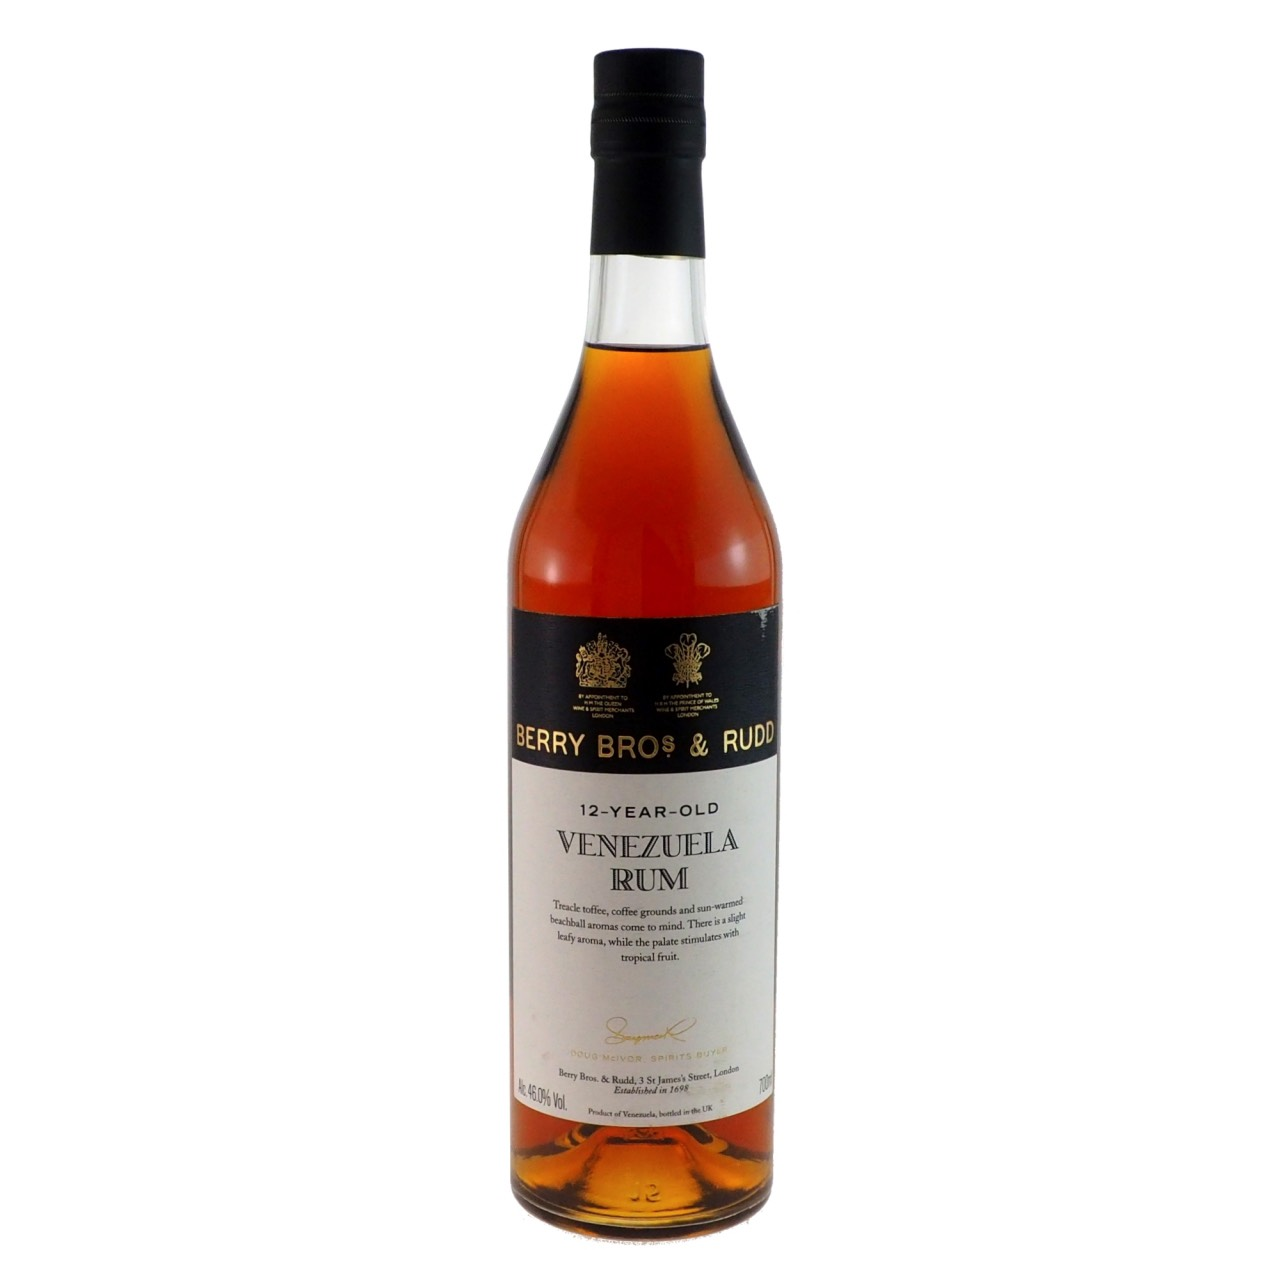 Bottle image of Venezuela Rum for Haromex Dev.